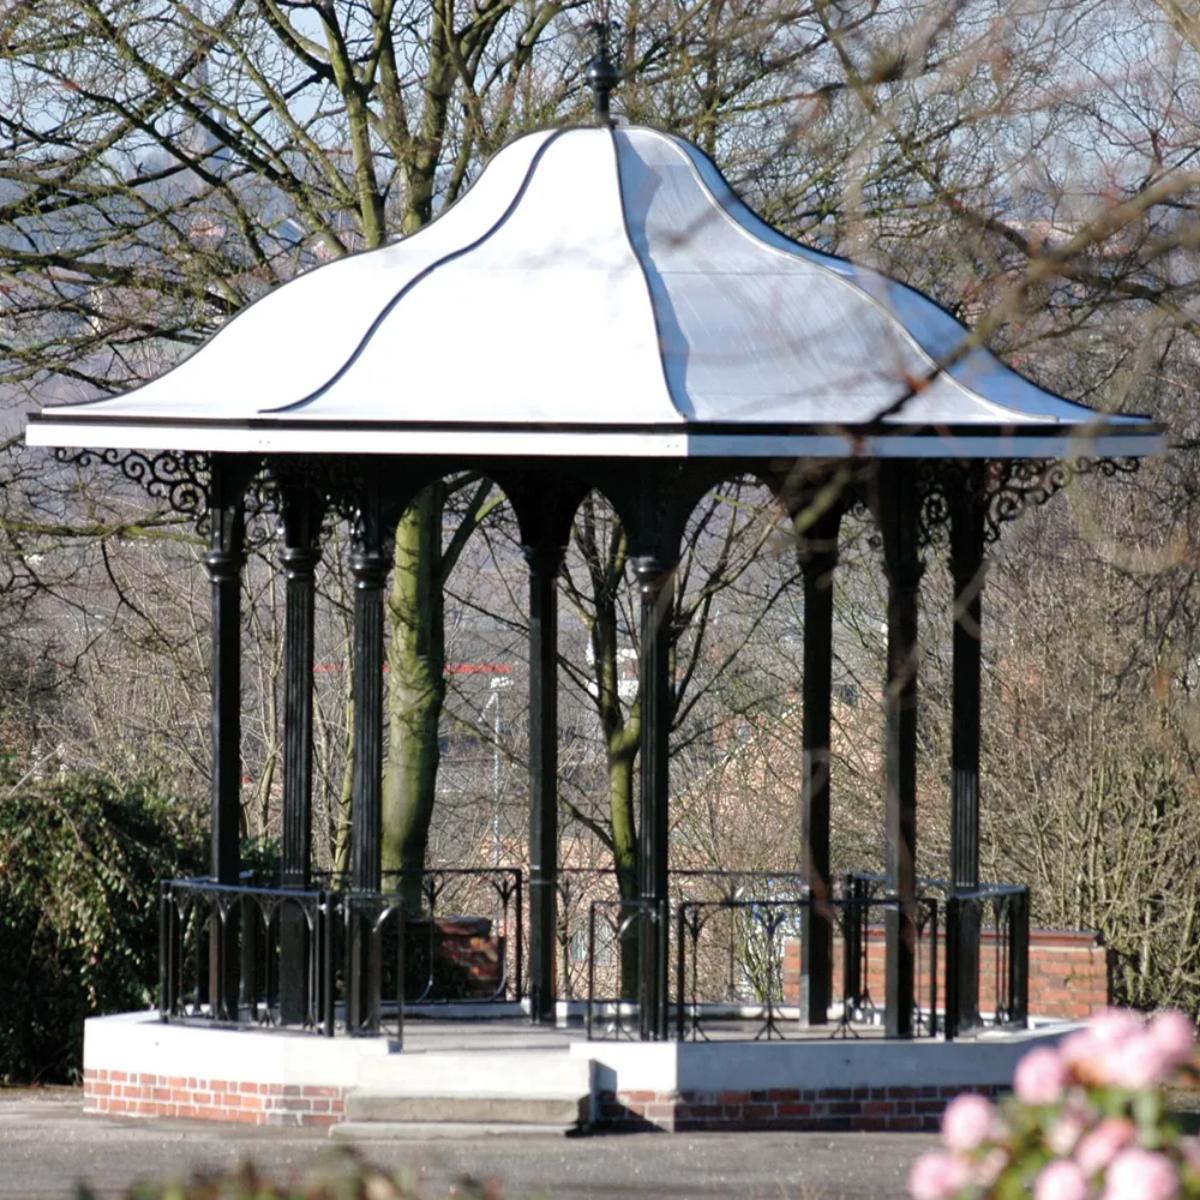 Burslem Bandstand